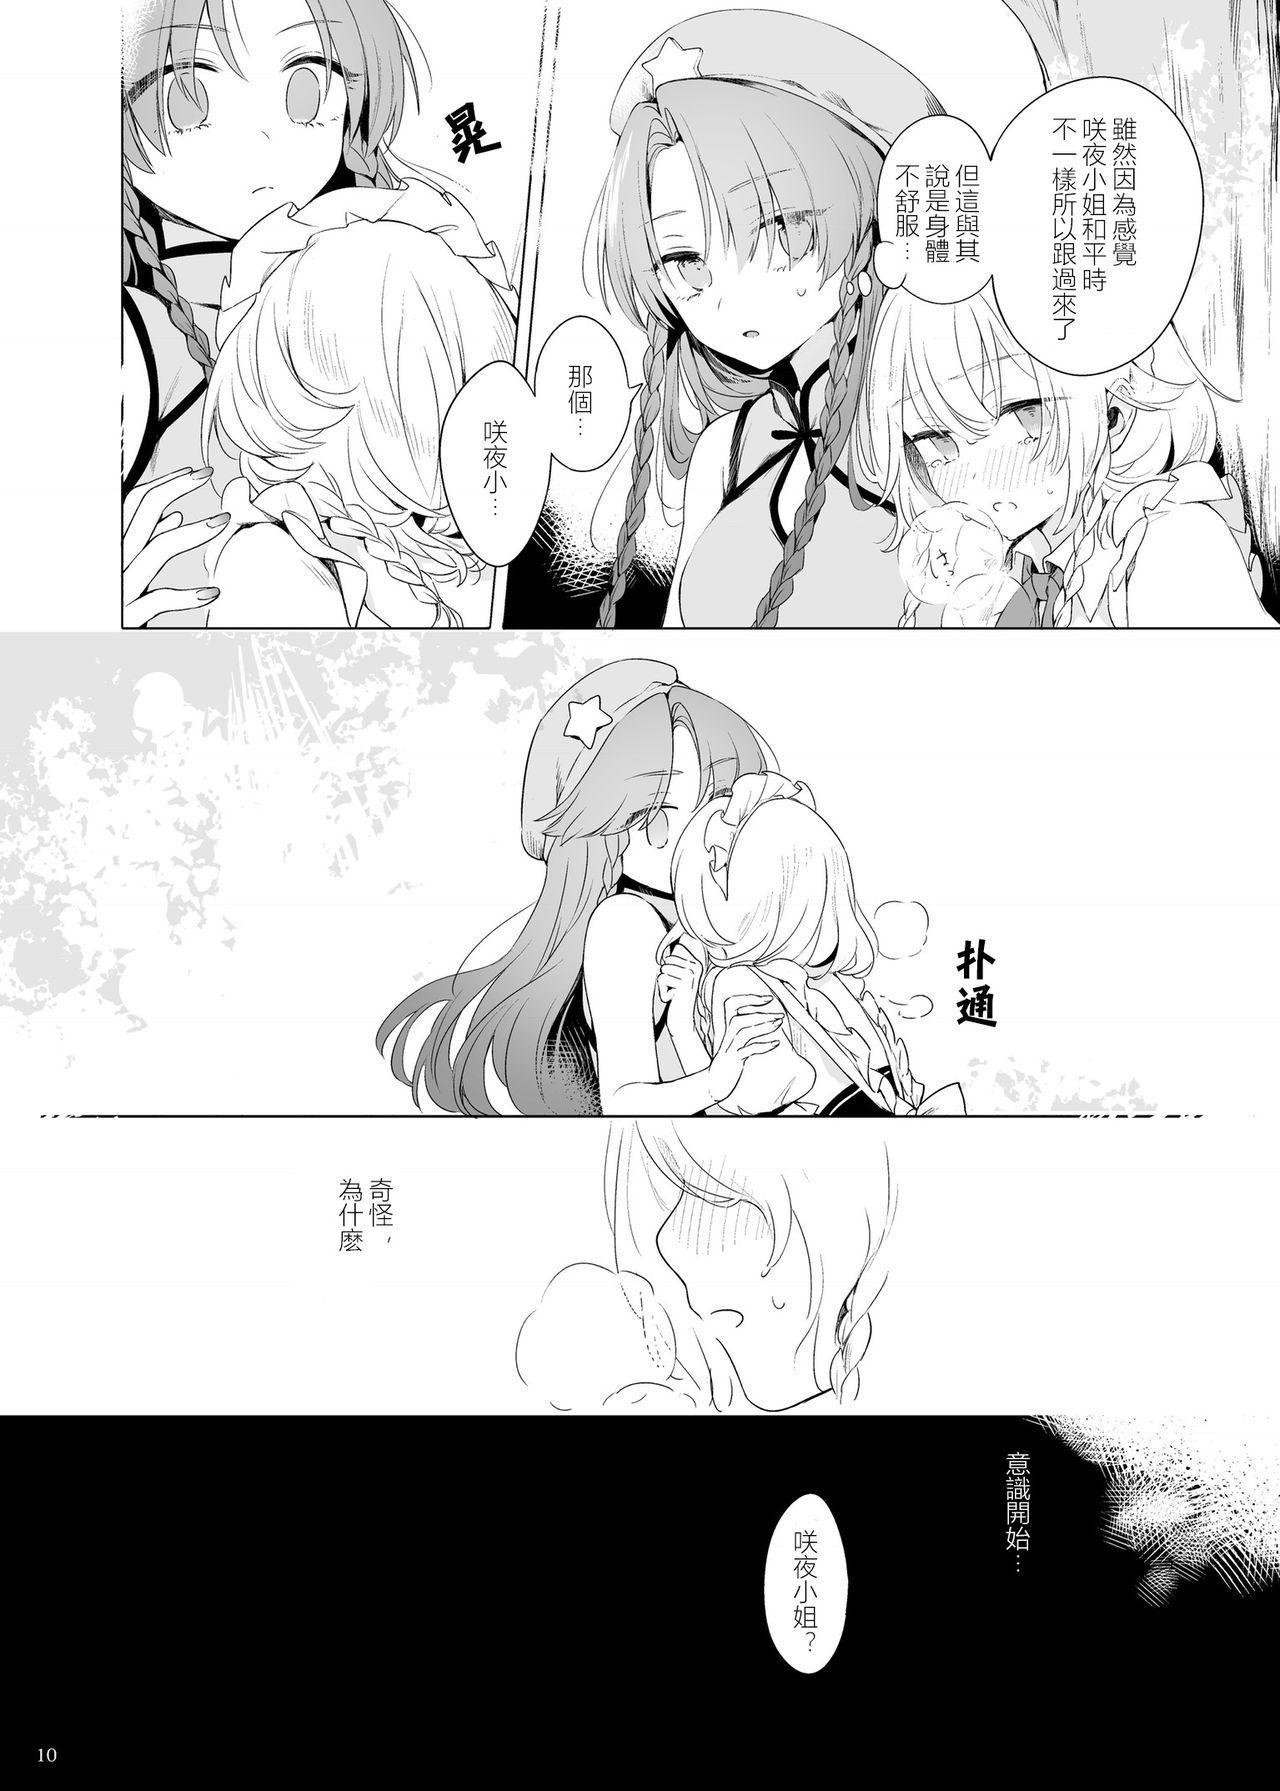 Meiling ni Kawaigarareru Sakuya-san ga Mitai Hon   想看被美鈴寵愛的咲夜小姐的同人本 9